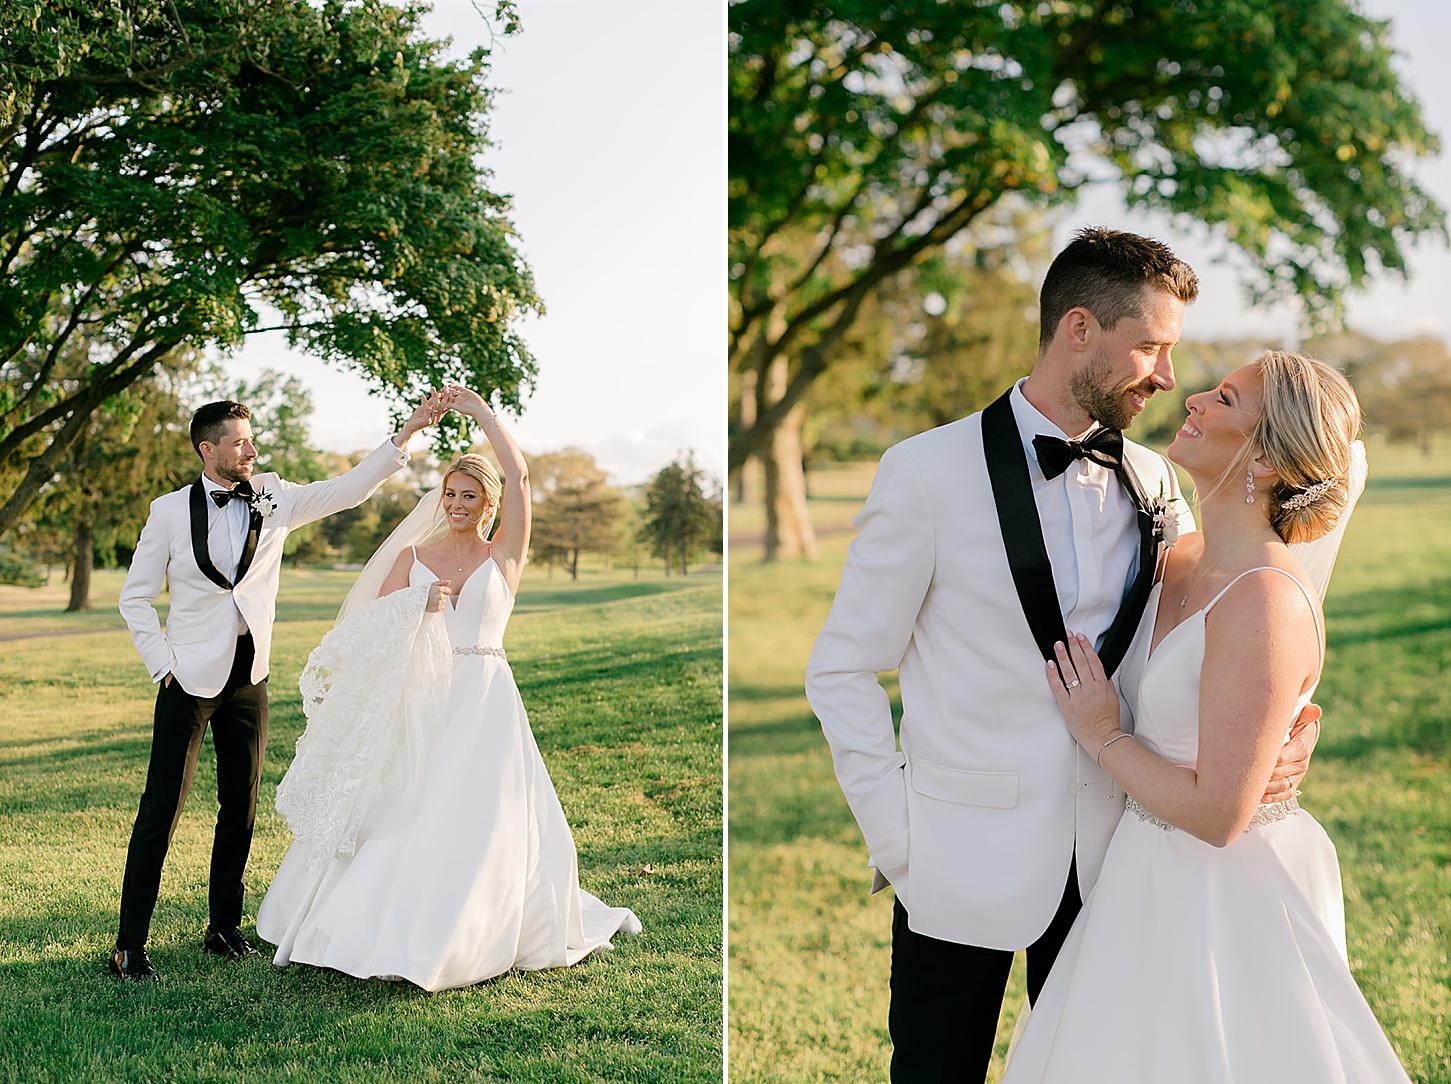 Linwood Country Club Summer Wedding Photography Studio by Magdalena Studios Jenn Kyle 0044